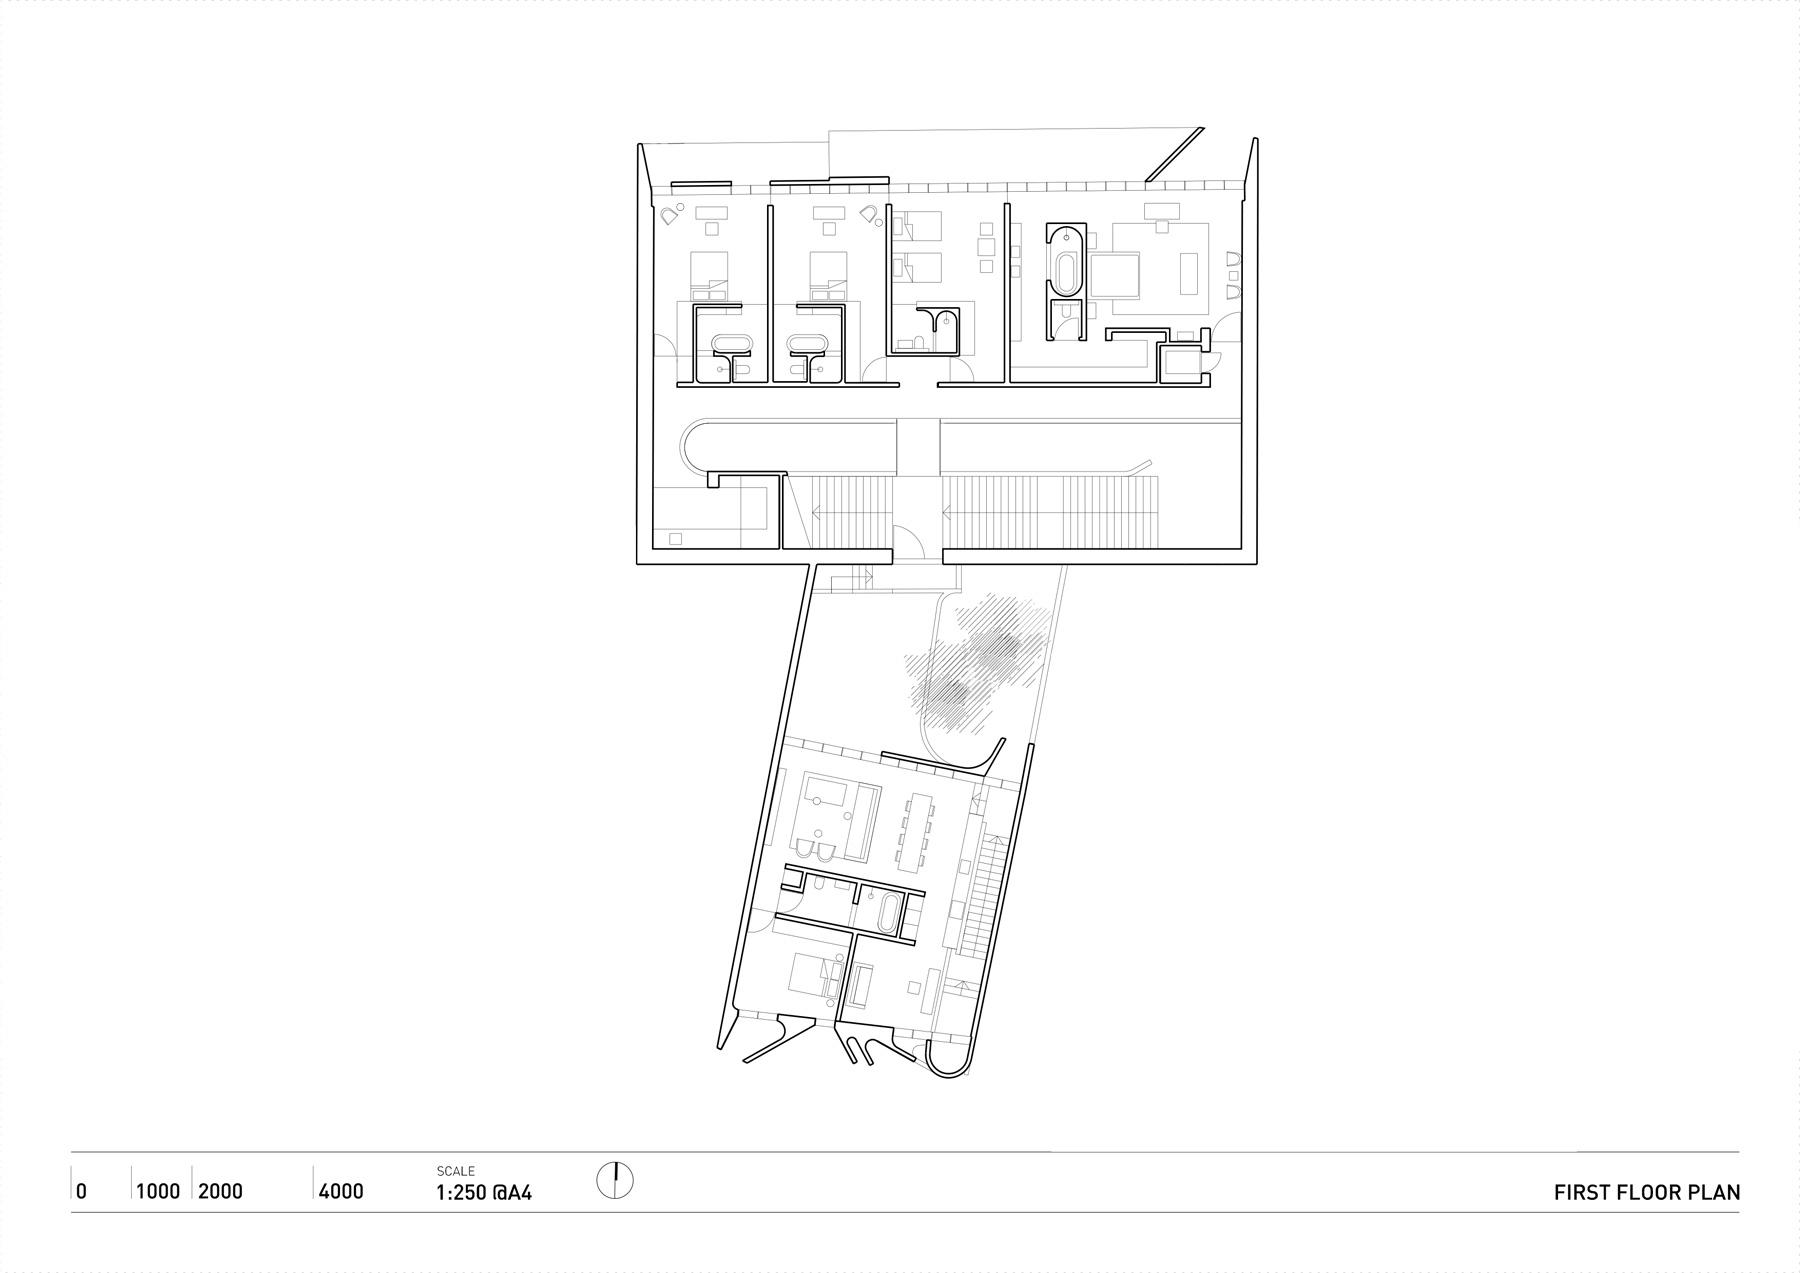 Indigo Slam First Floor Plan | Yellowtrace